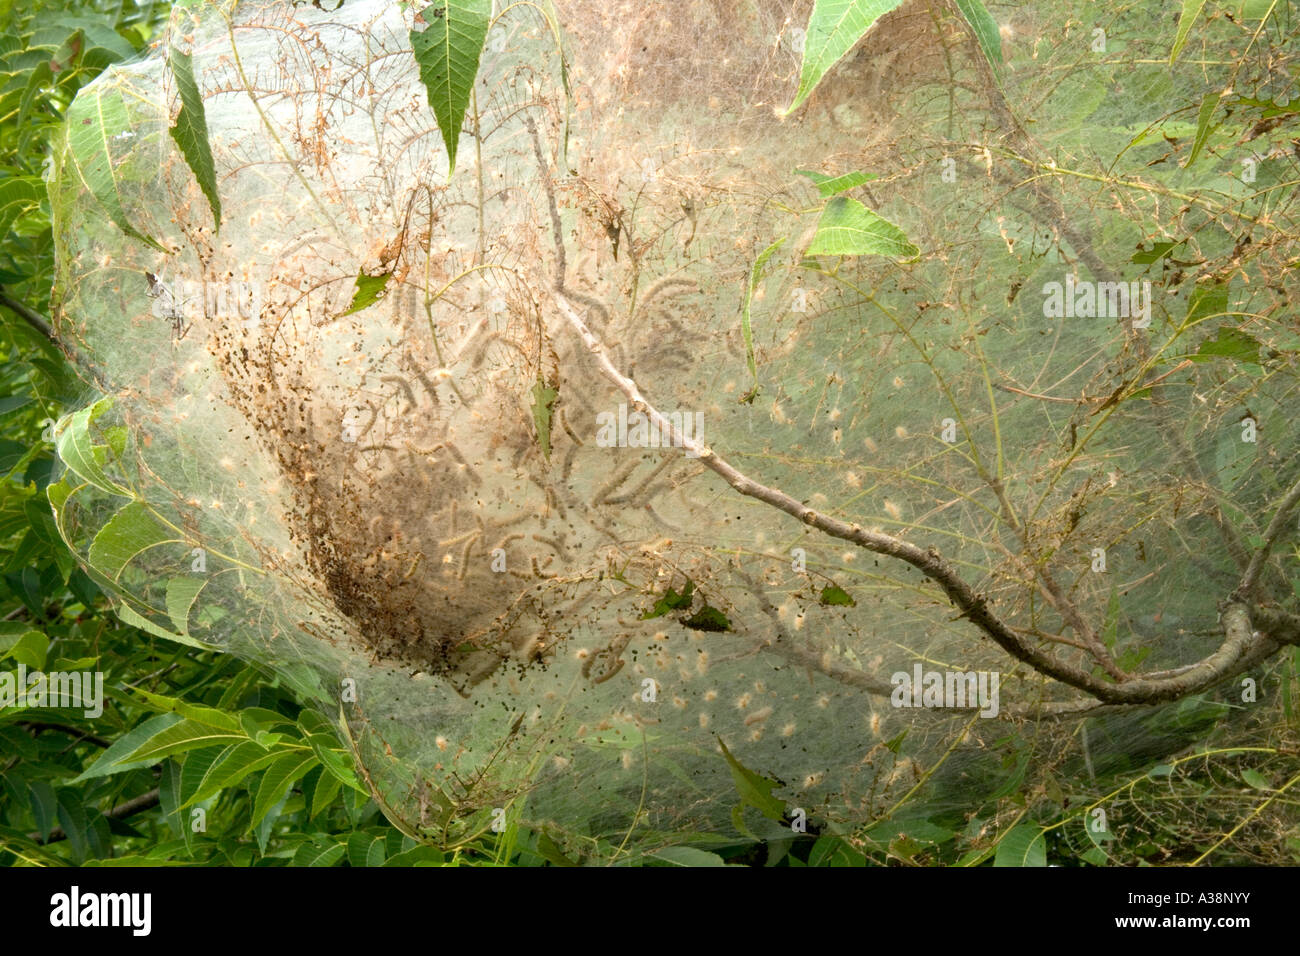 Eastern Tent Caterpillars  nesting web, Florida - Stock Image